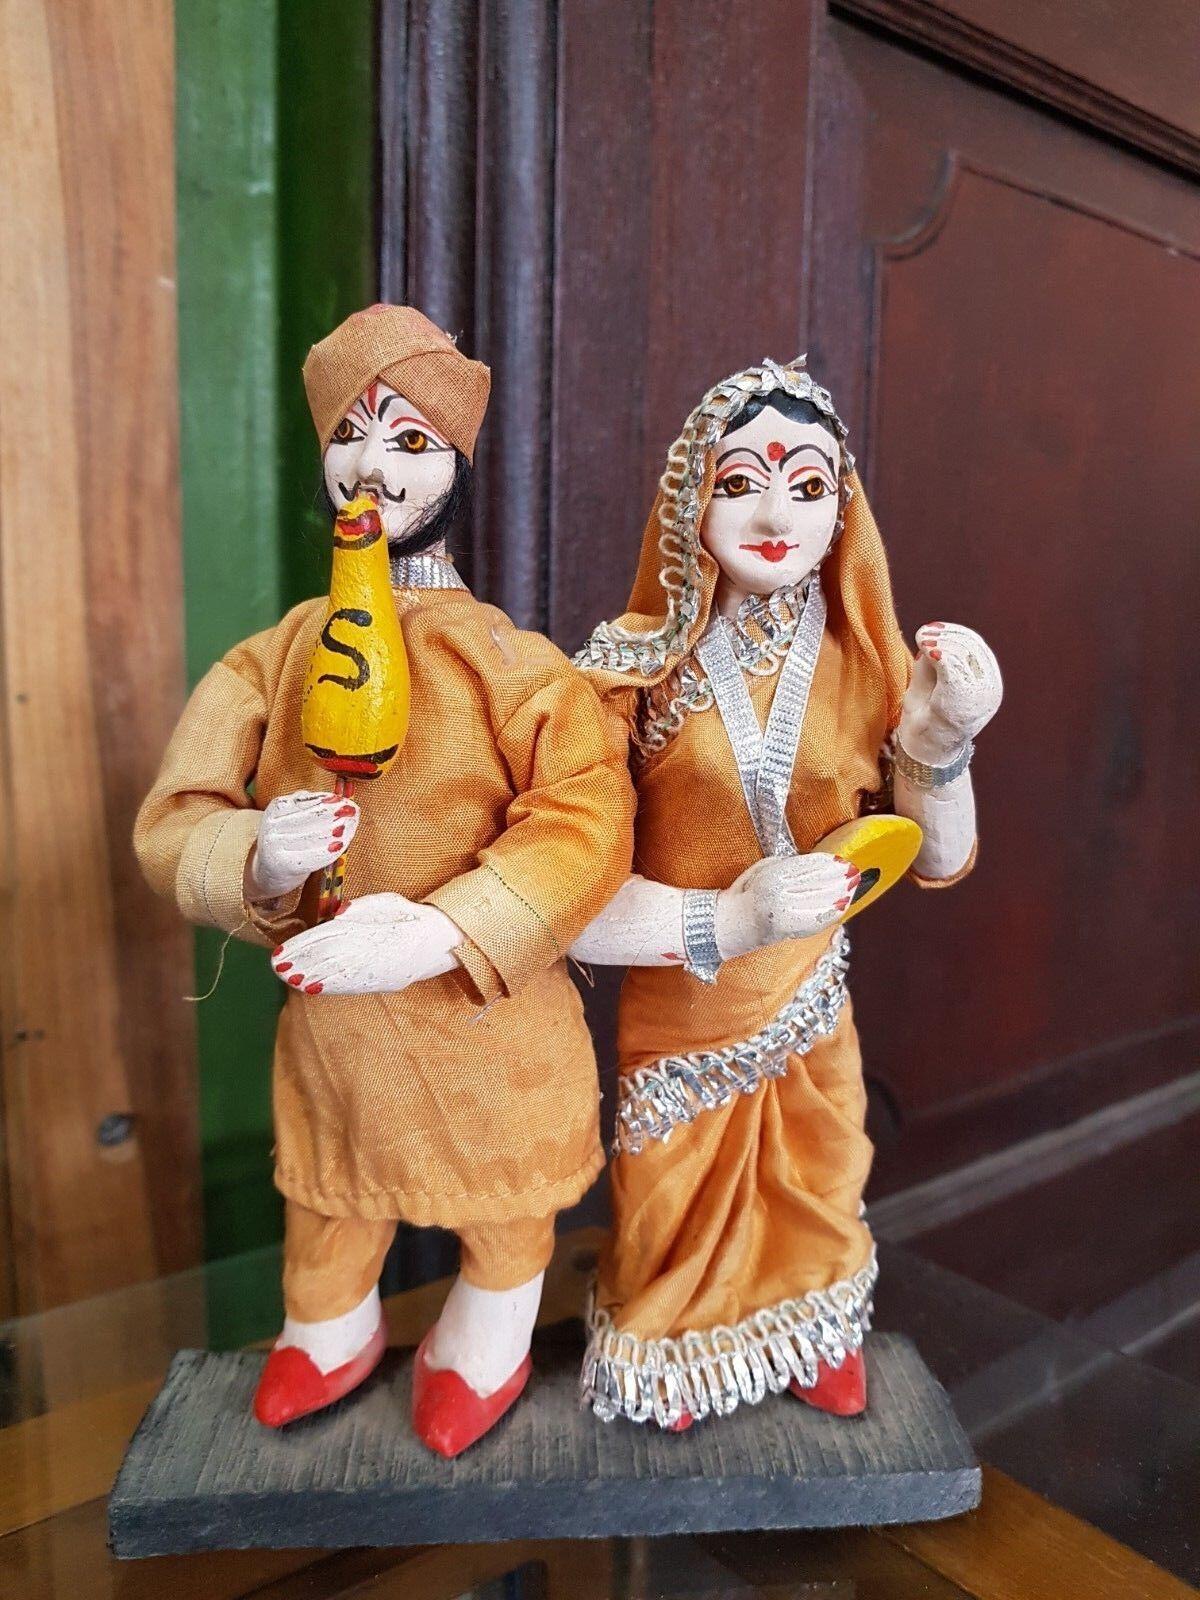 1940 Vintage Old Handmade Indian Traditional Wear Porcelain Snake Charmers Dolls